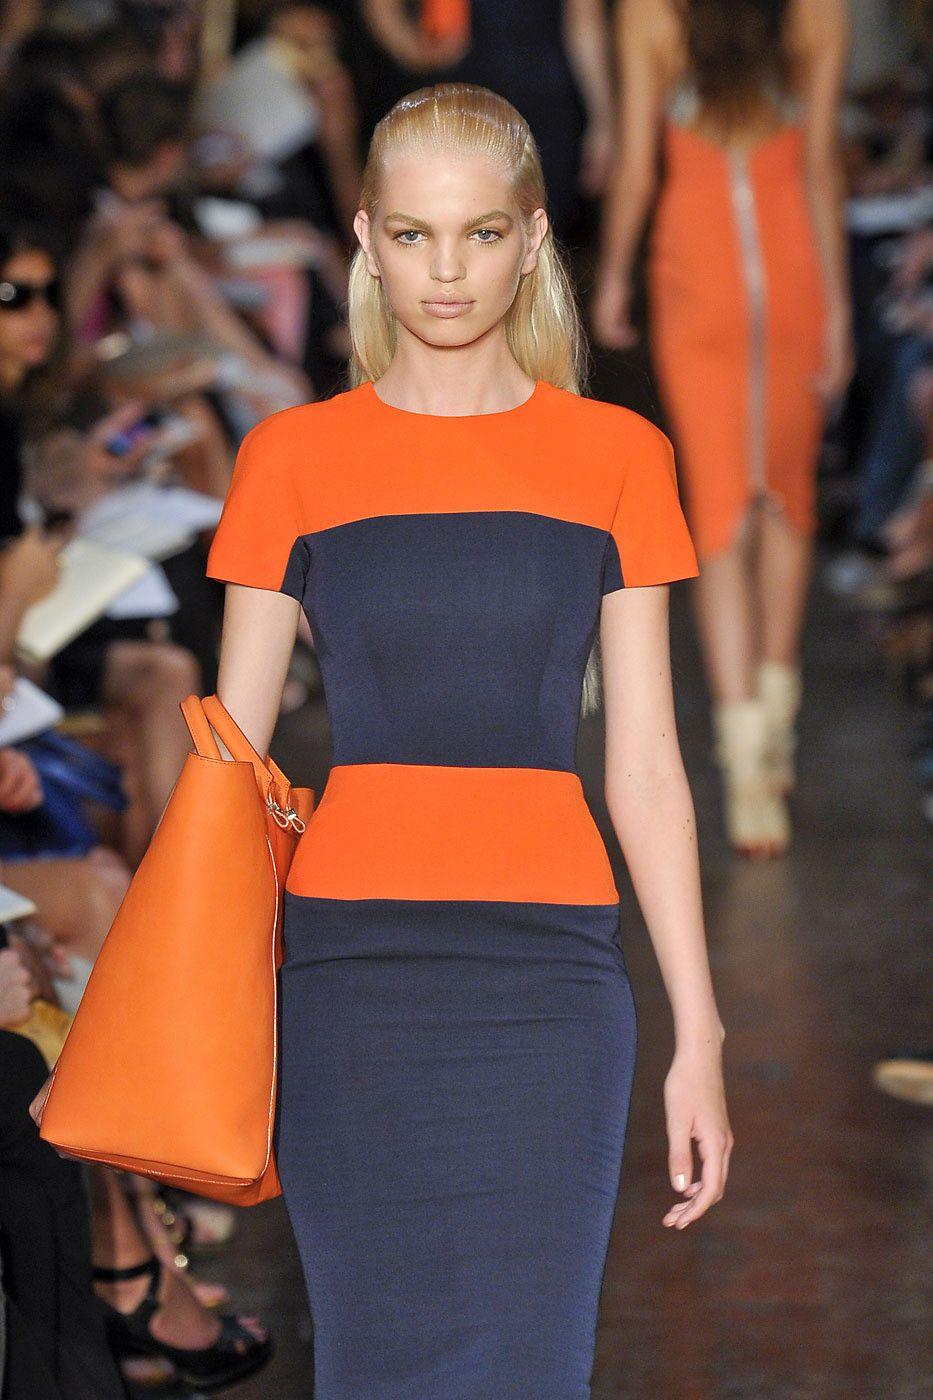 Victoria Beckham at New York Fashion Week Spring 2012